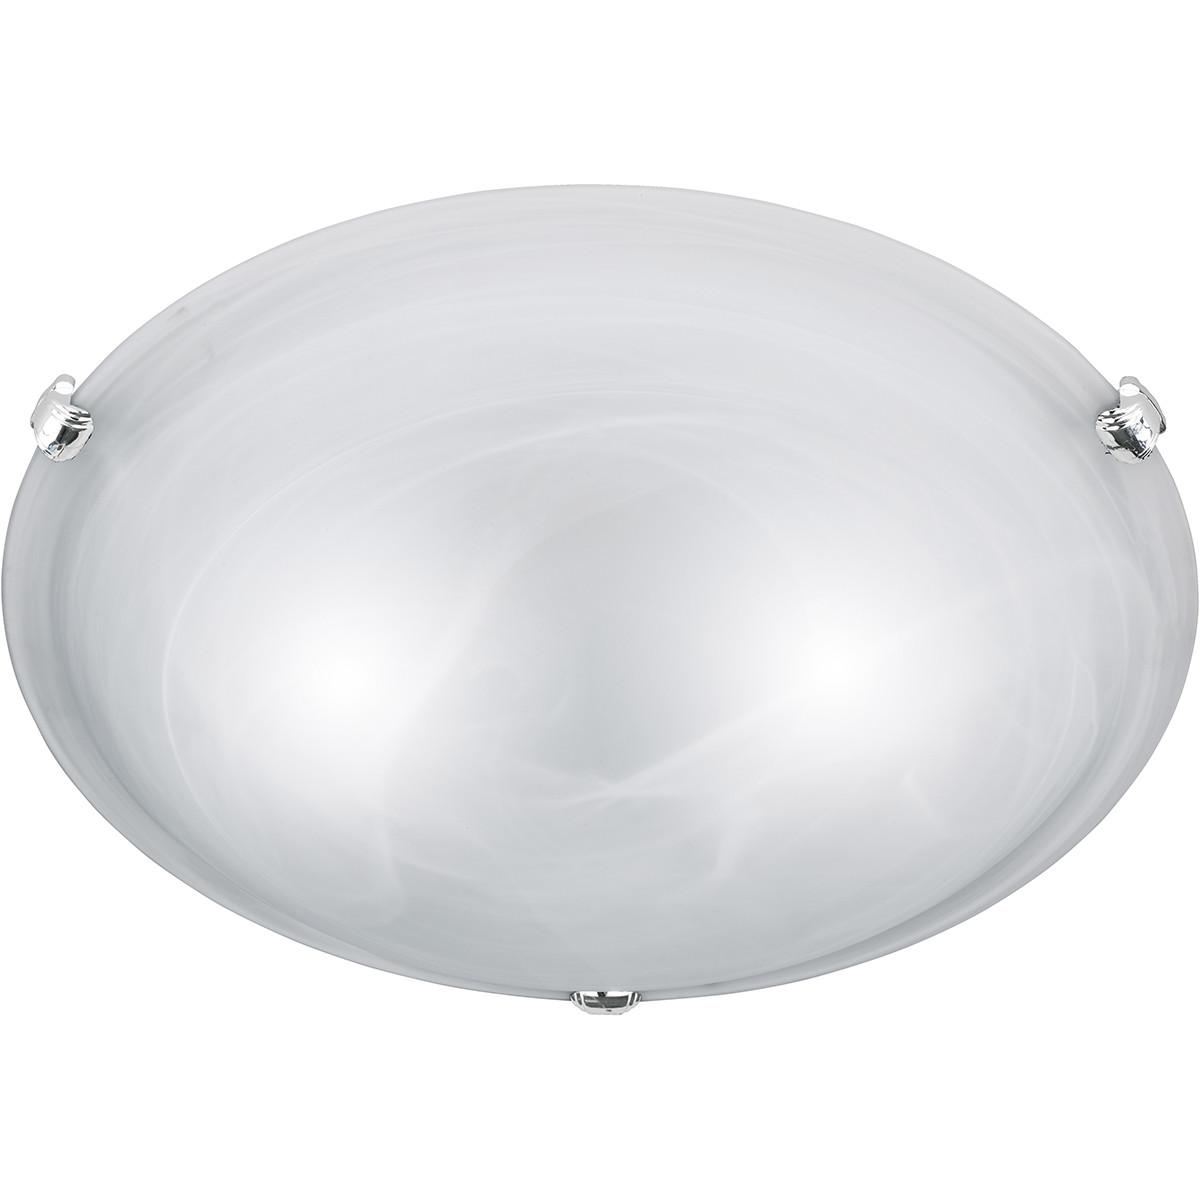 LED Plafondlamp - Plafondverlichting - Trion Adirona XL - E27 Fitting - Rond - Mat Nikkel - Aluminiu